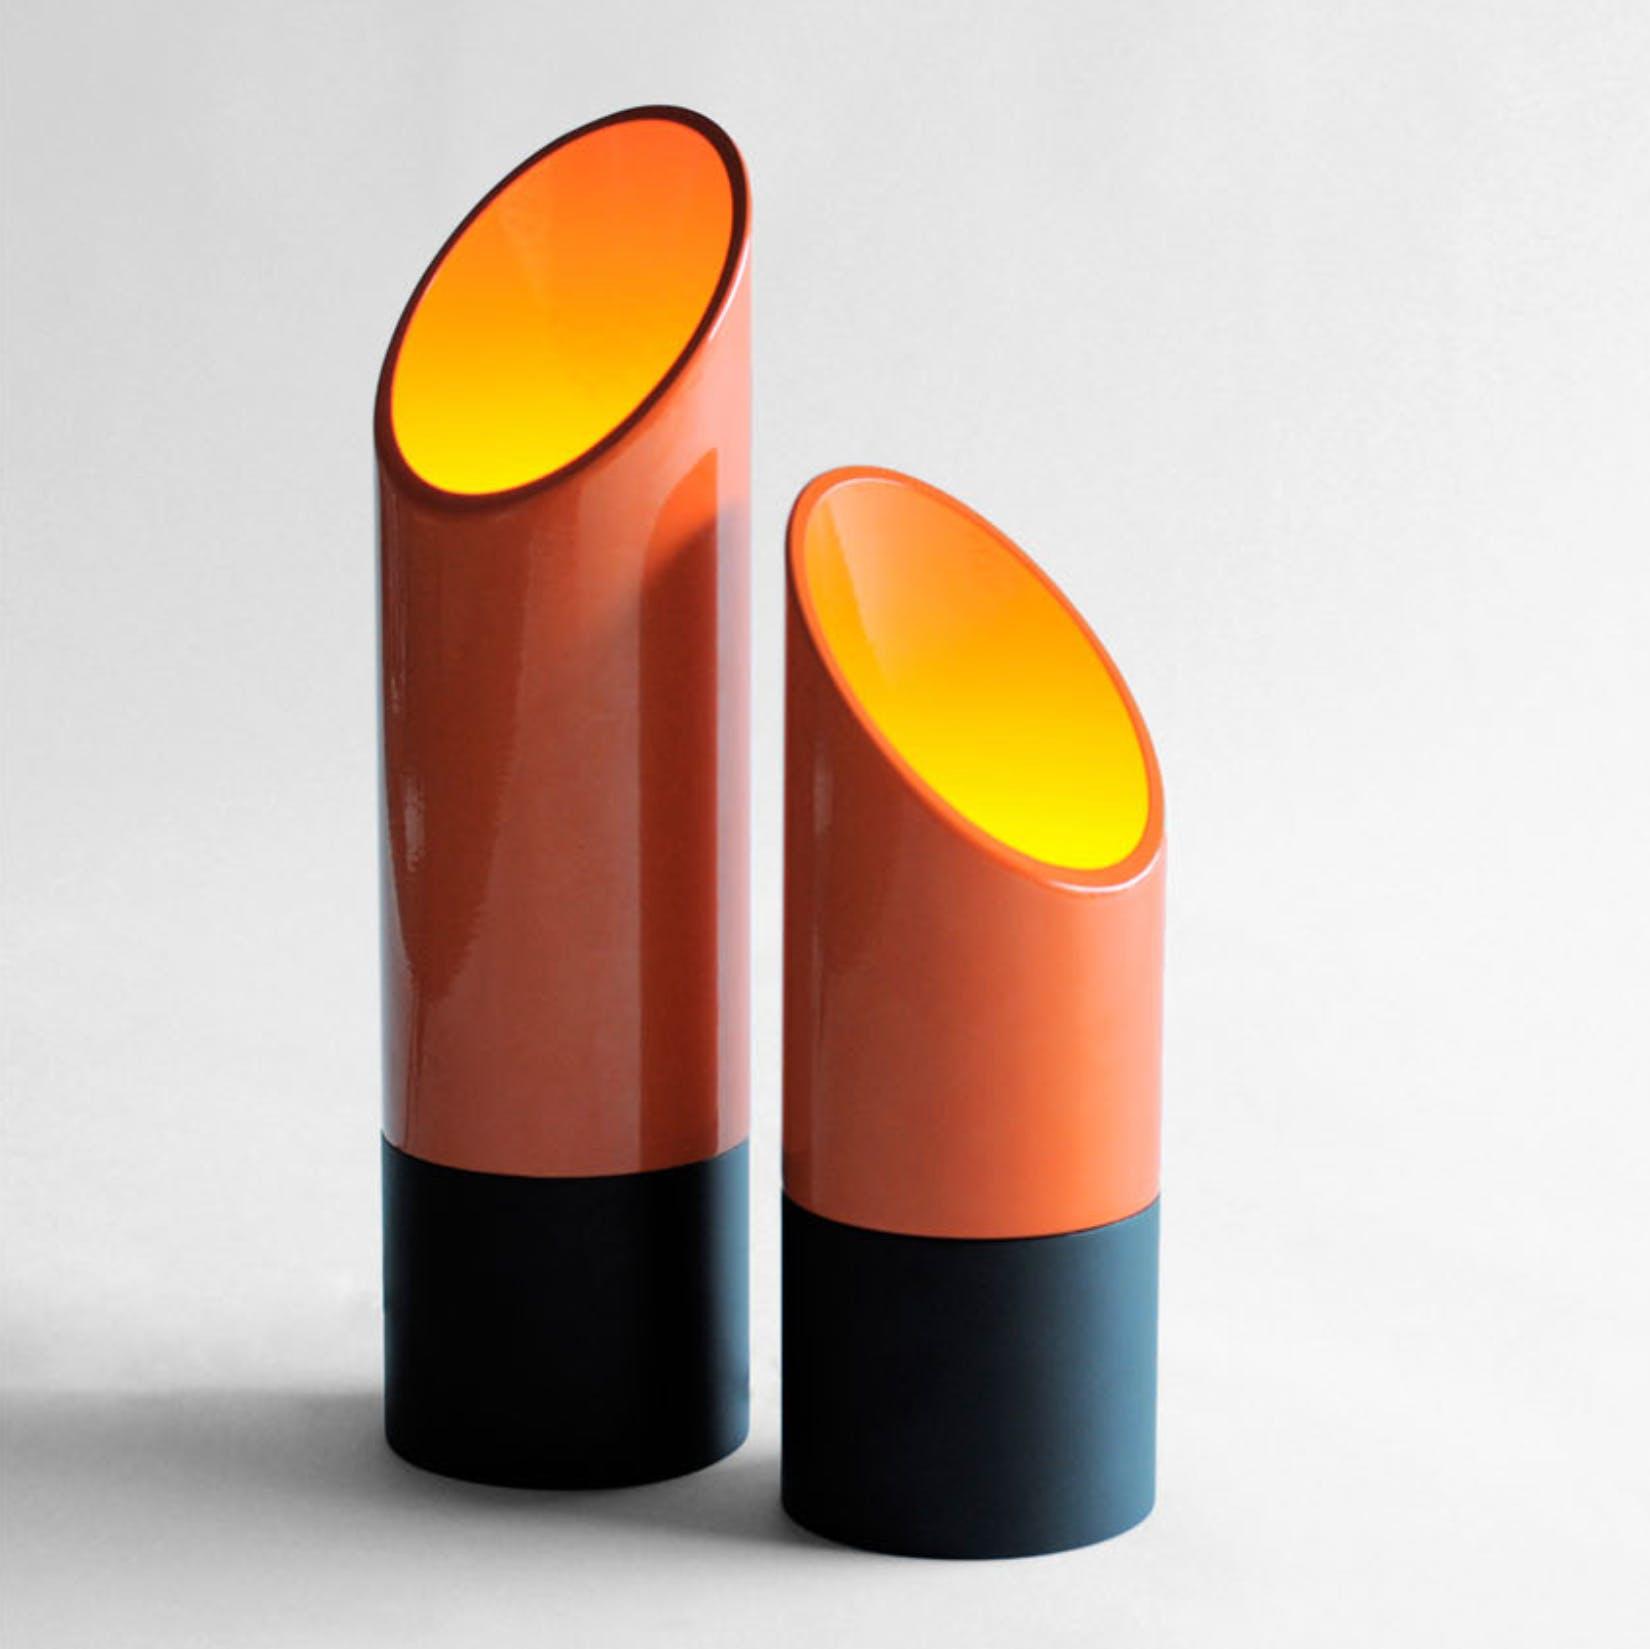 Phase Design Lipstick Table Orange Haute Living